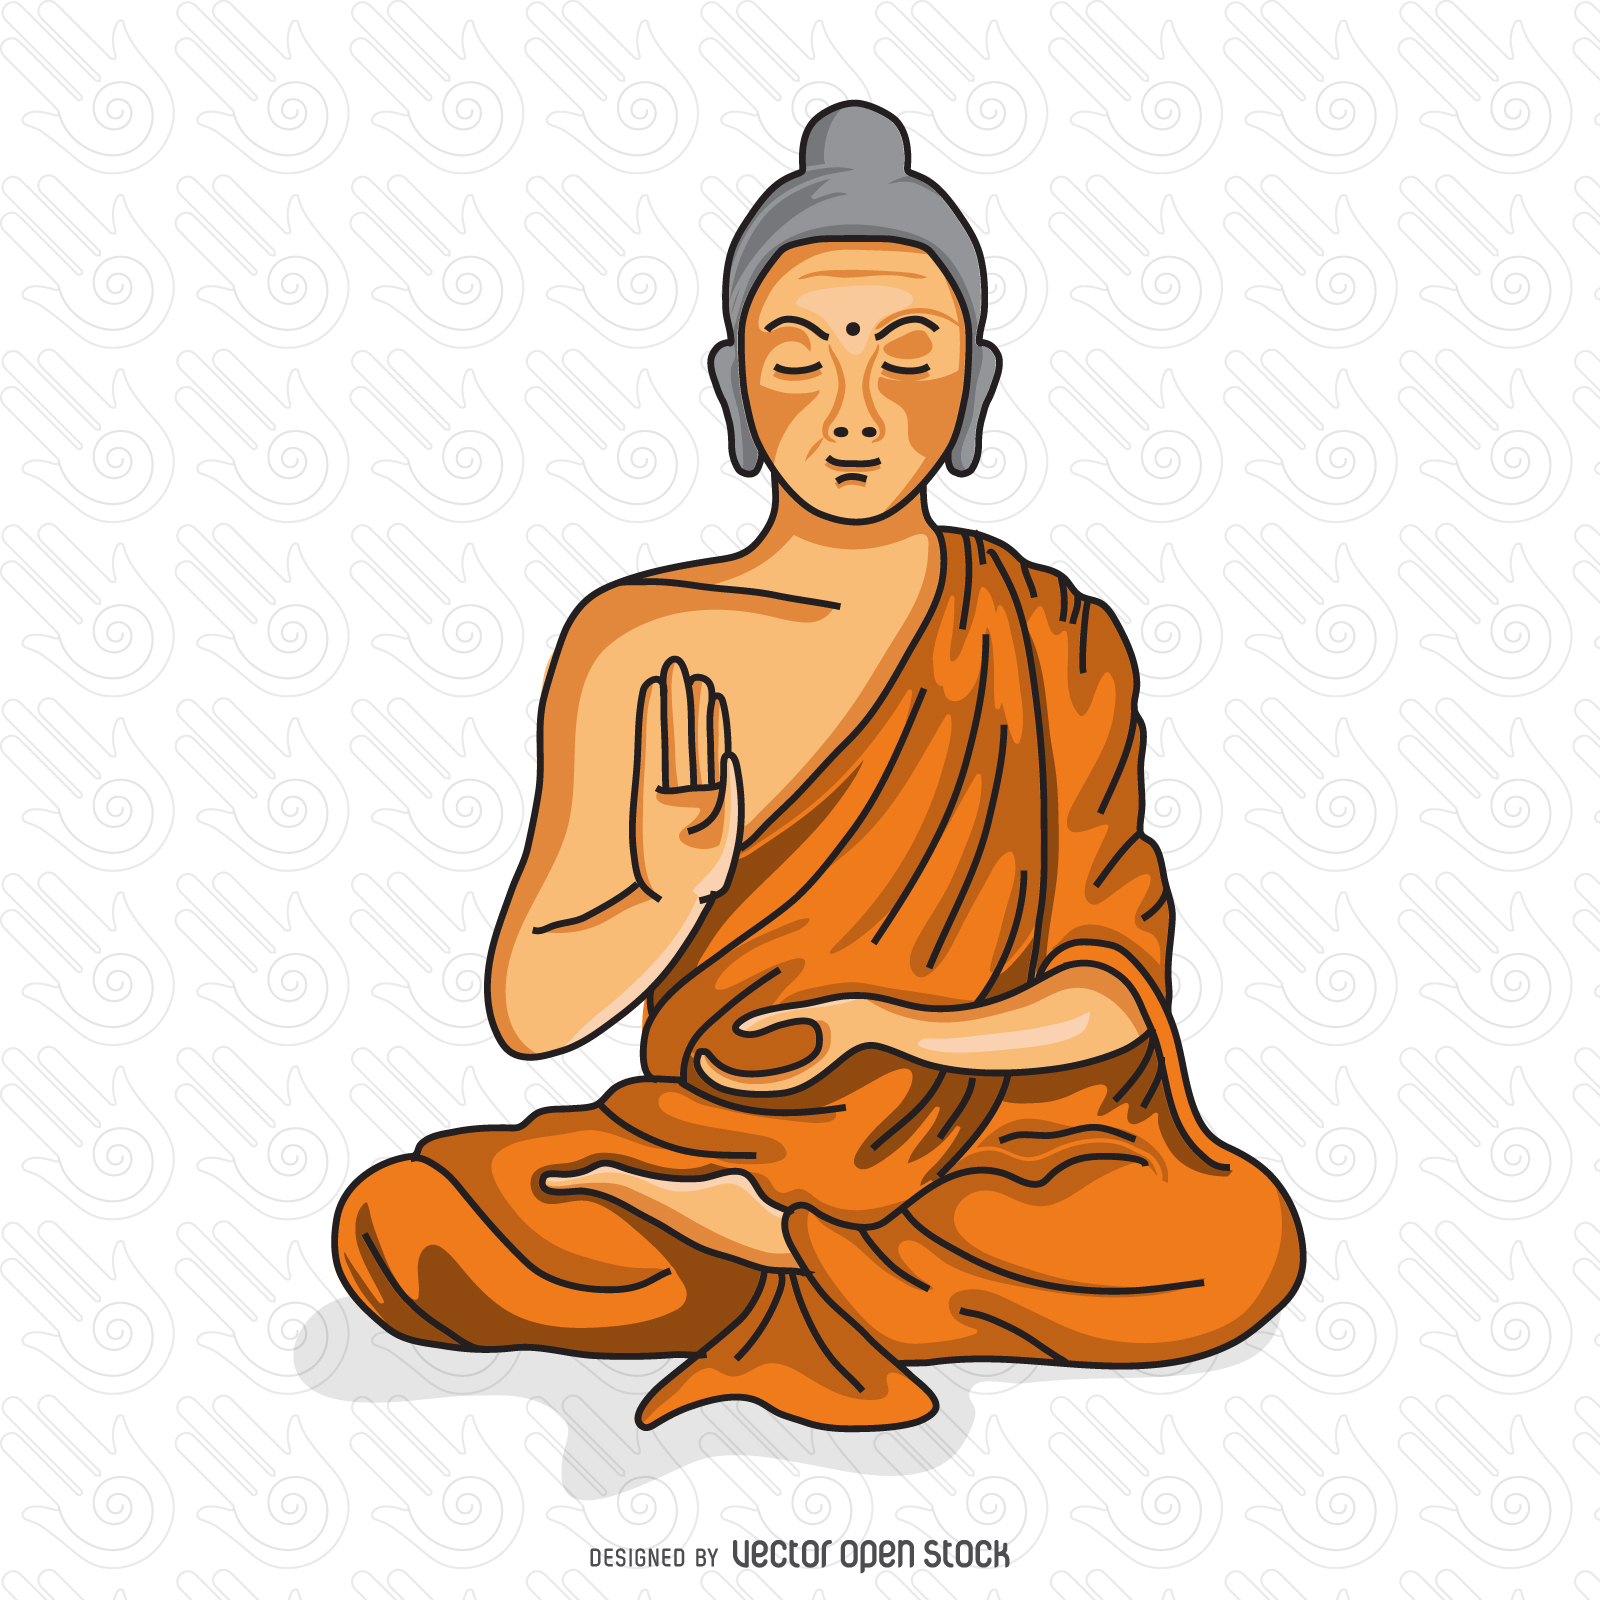 1600x1600 Buddhist Monk Meditating Illustration Buddhist Monk